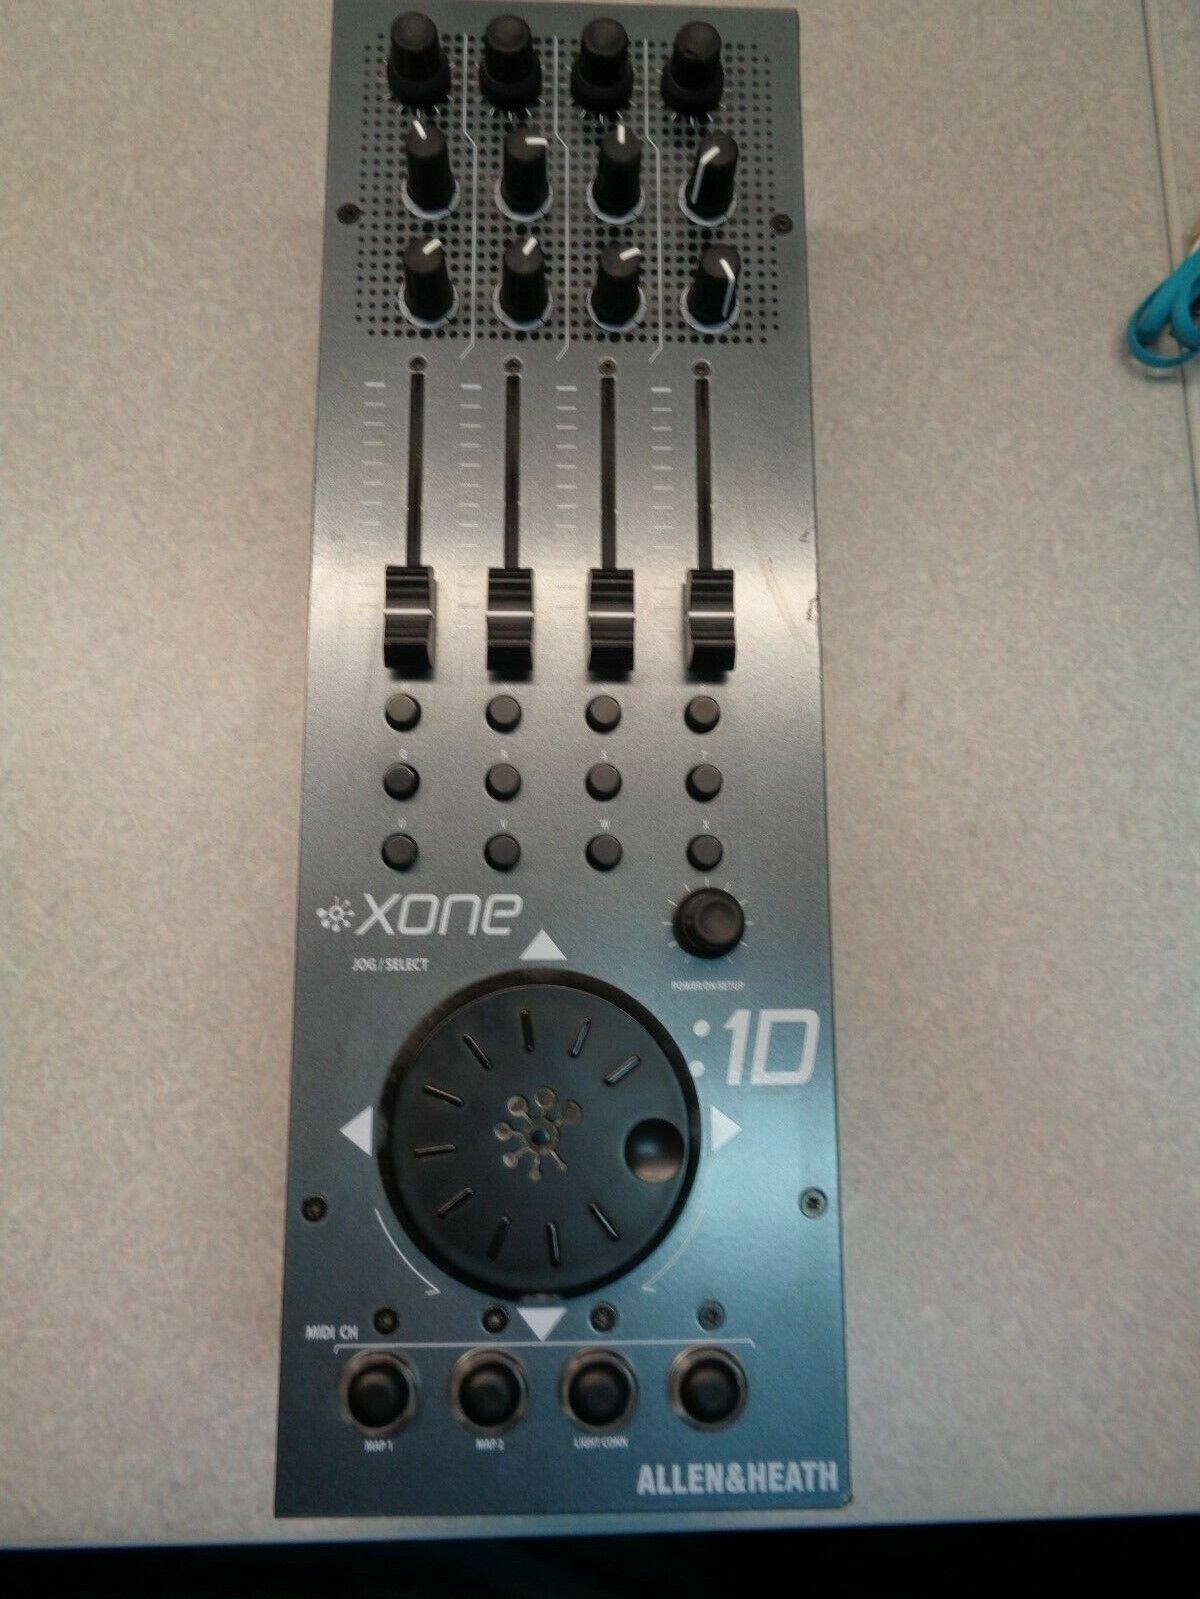 Allen & Heath Xone 1D DJ Mixer